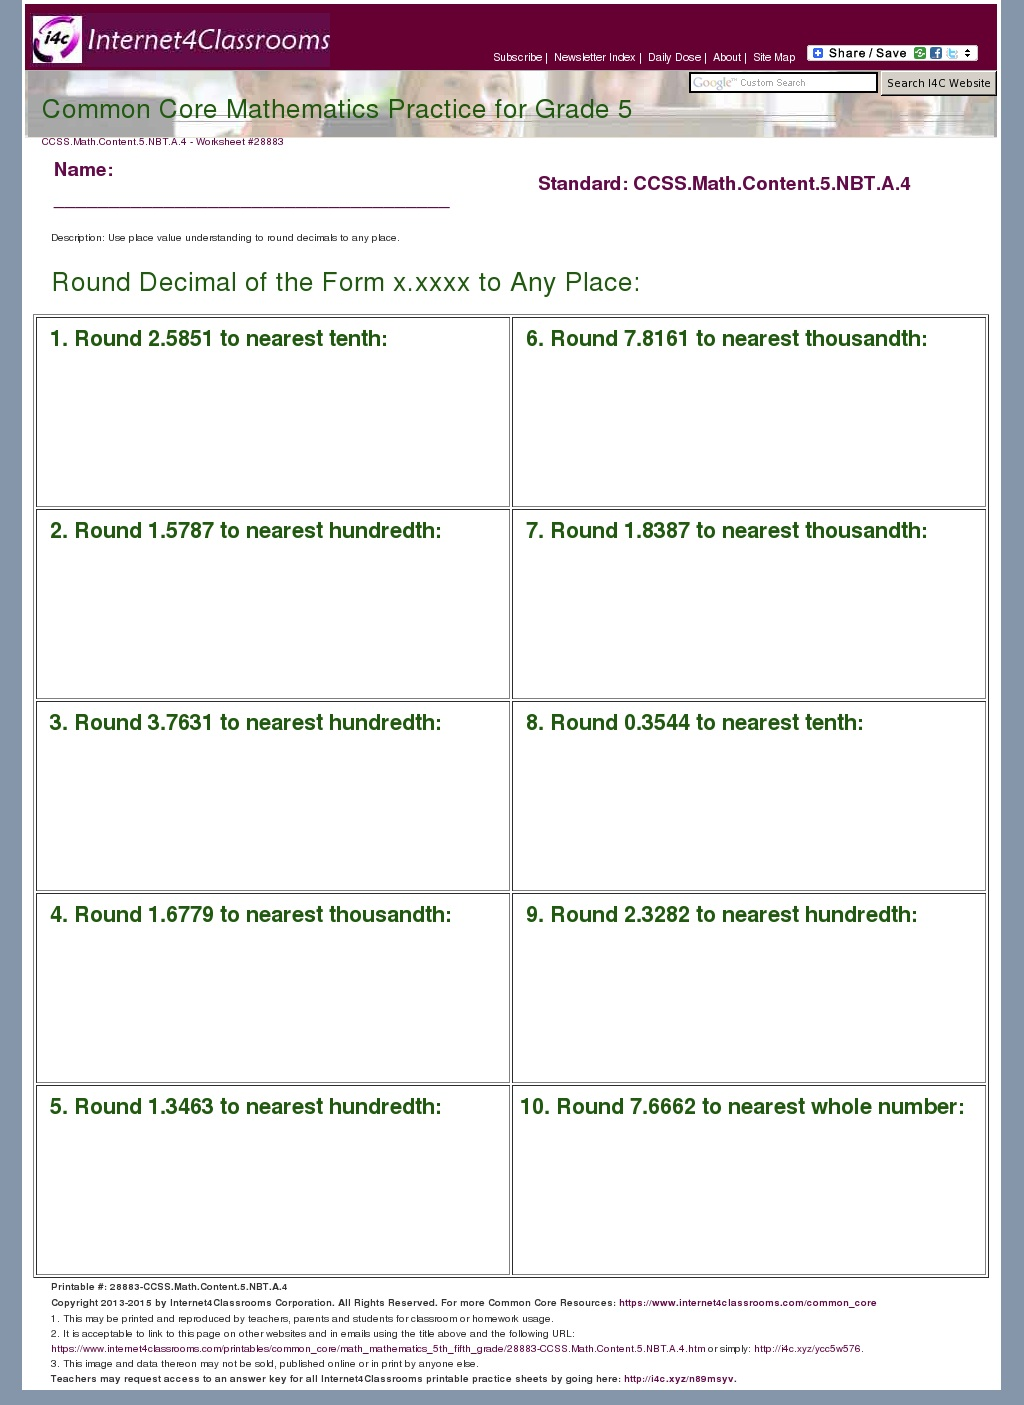 description download worksheet 28883 ccss math content 5 nbt a 4. Black Bedroom Furniture Sets. Home Design Ideas